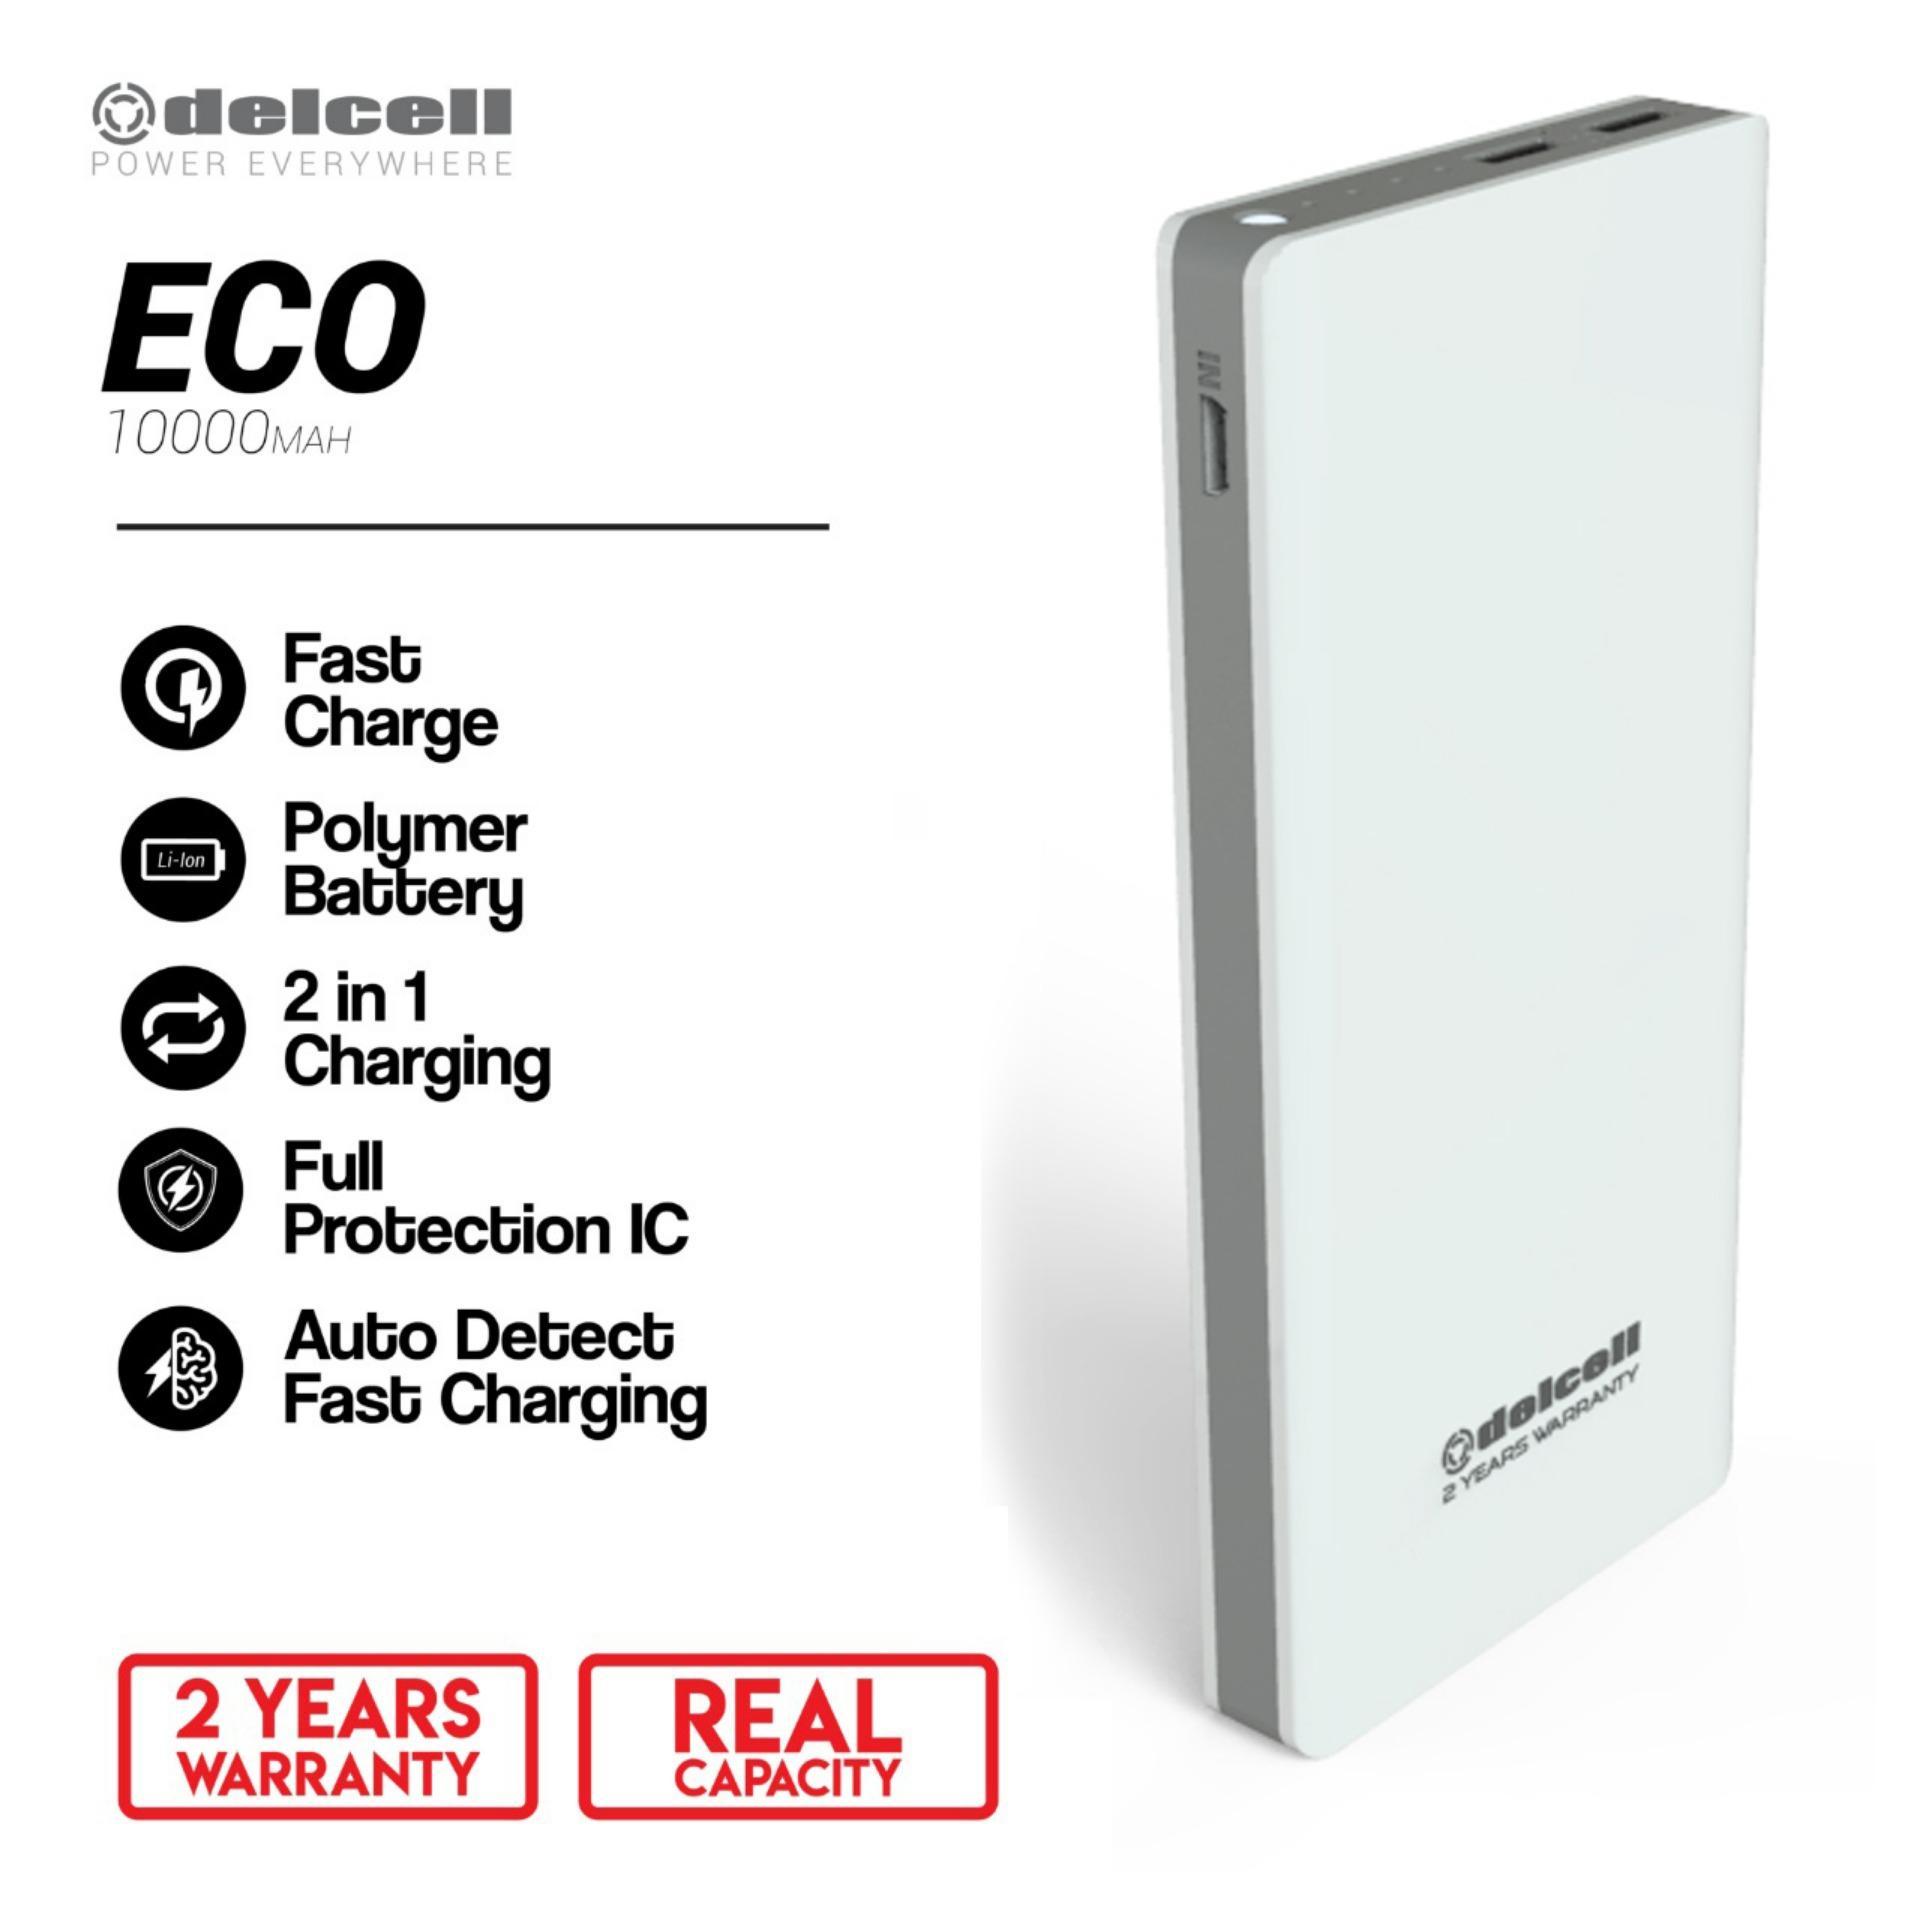 Delcell 10000mAh Powerbank ECO Real Capacity Fast Charging Slim Powerbank Polymer Battery Garansi Resmi 1 Tahun